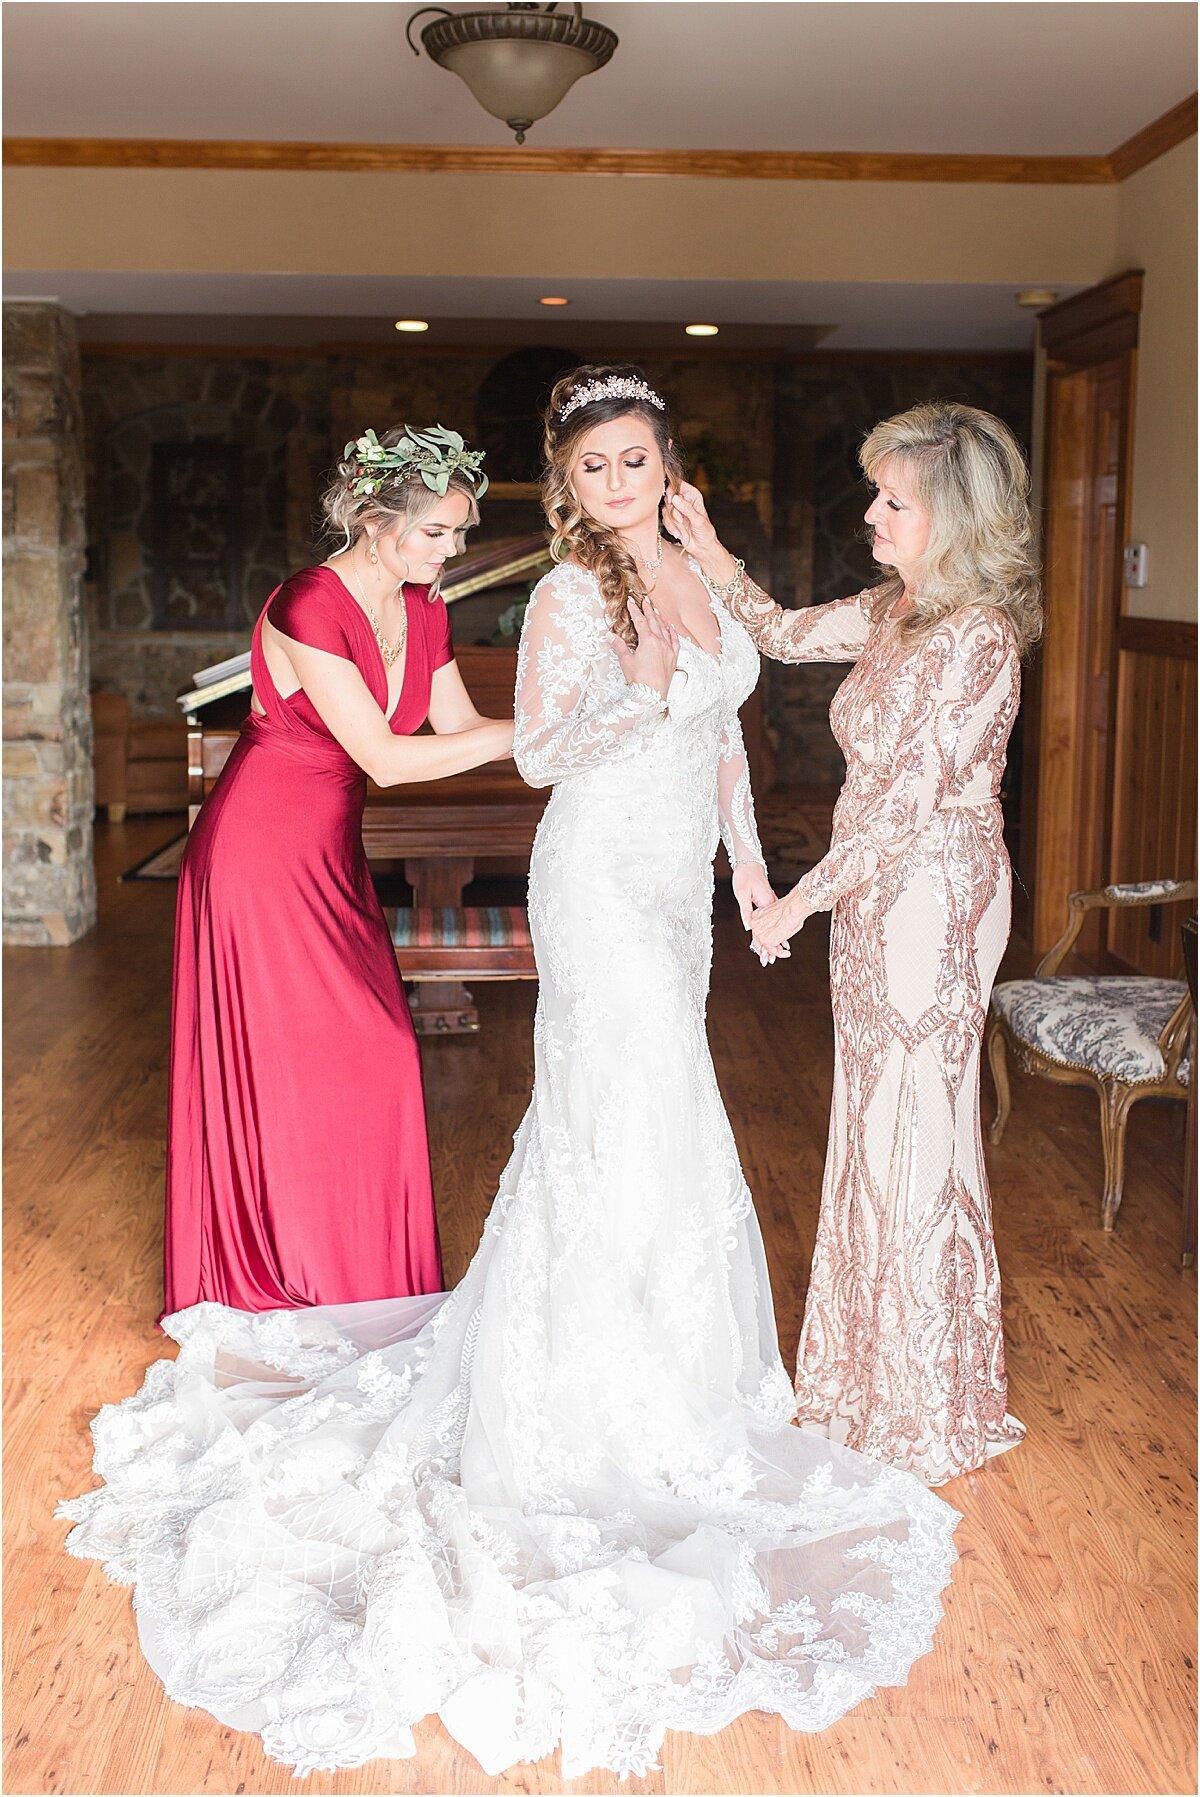 Jersey_Ga_Wedding_Venues_Holly_L_Robbins_Photography_0022.jpg